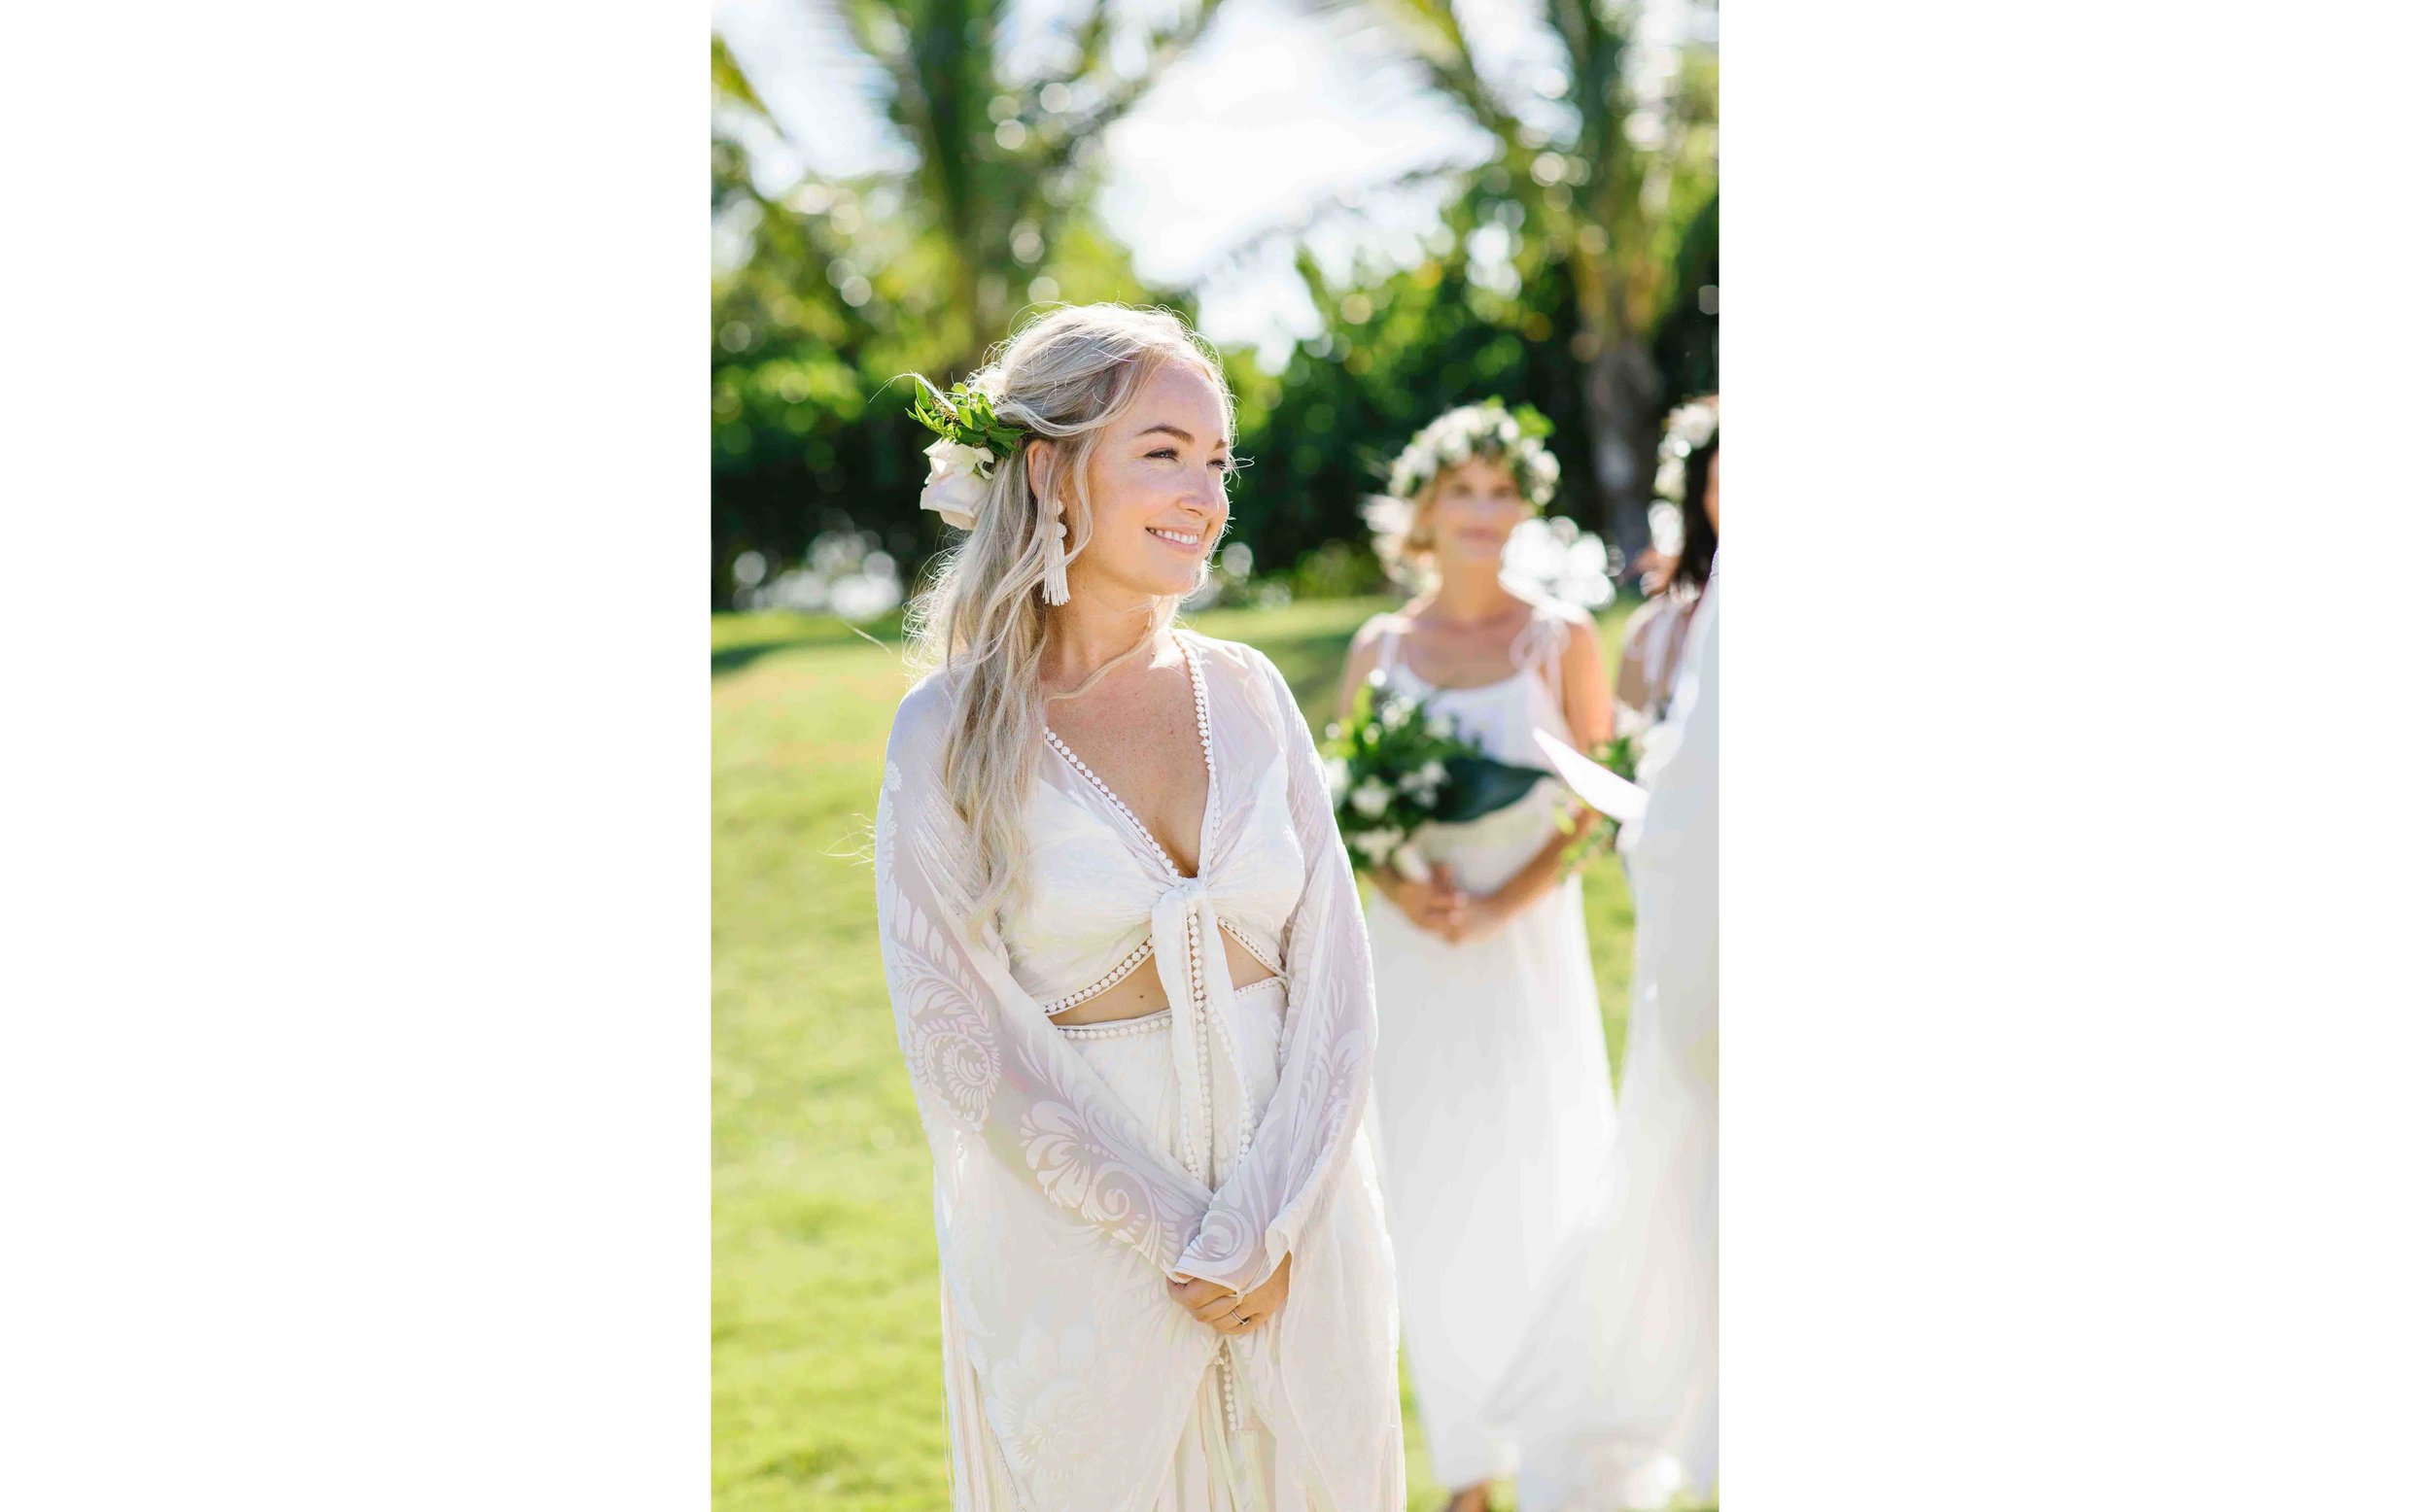 Bohemian Bride at her Hawaiian Wedding Ceremony